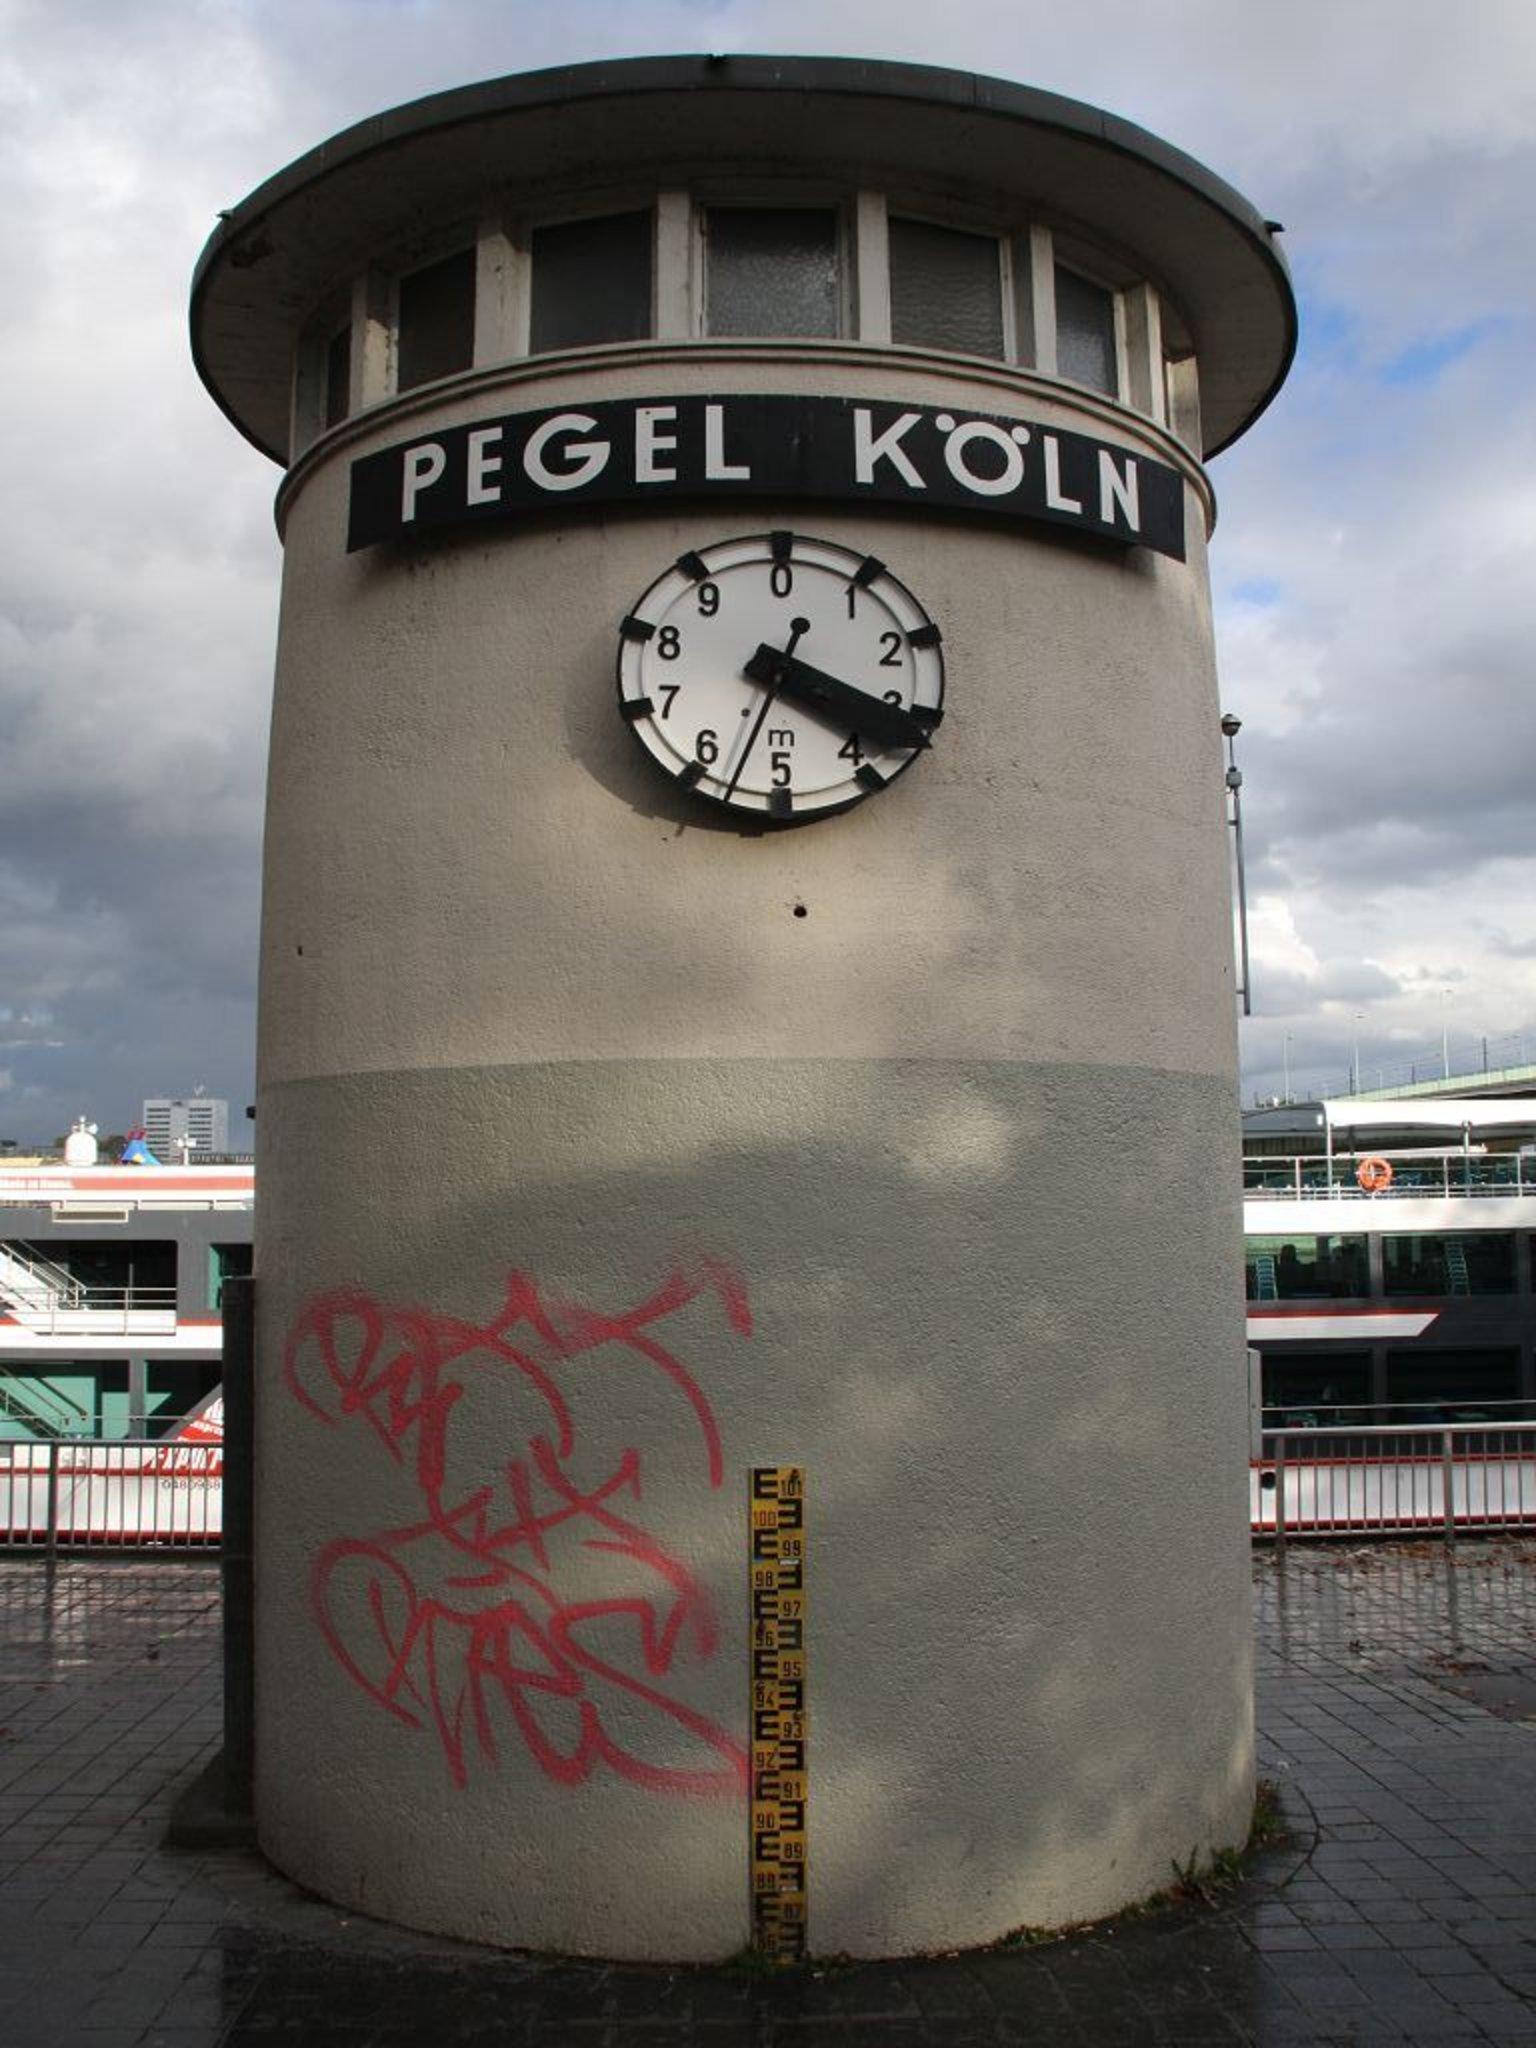 Pegel Köln Vorhersage